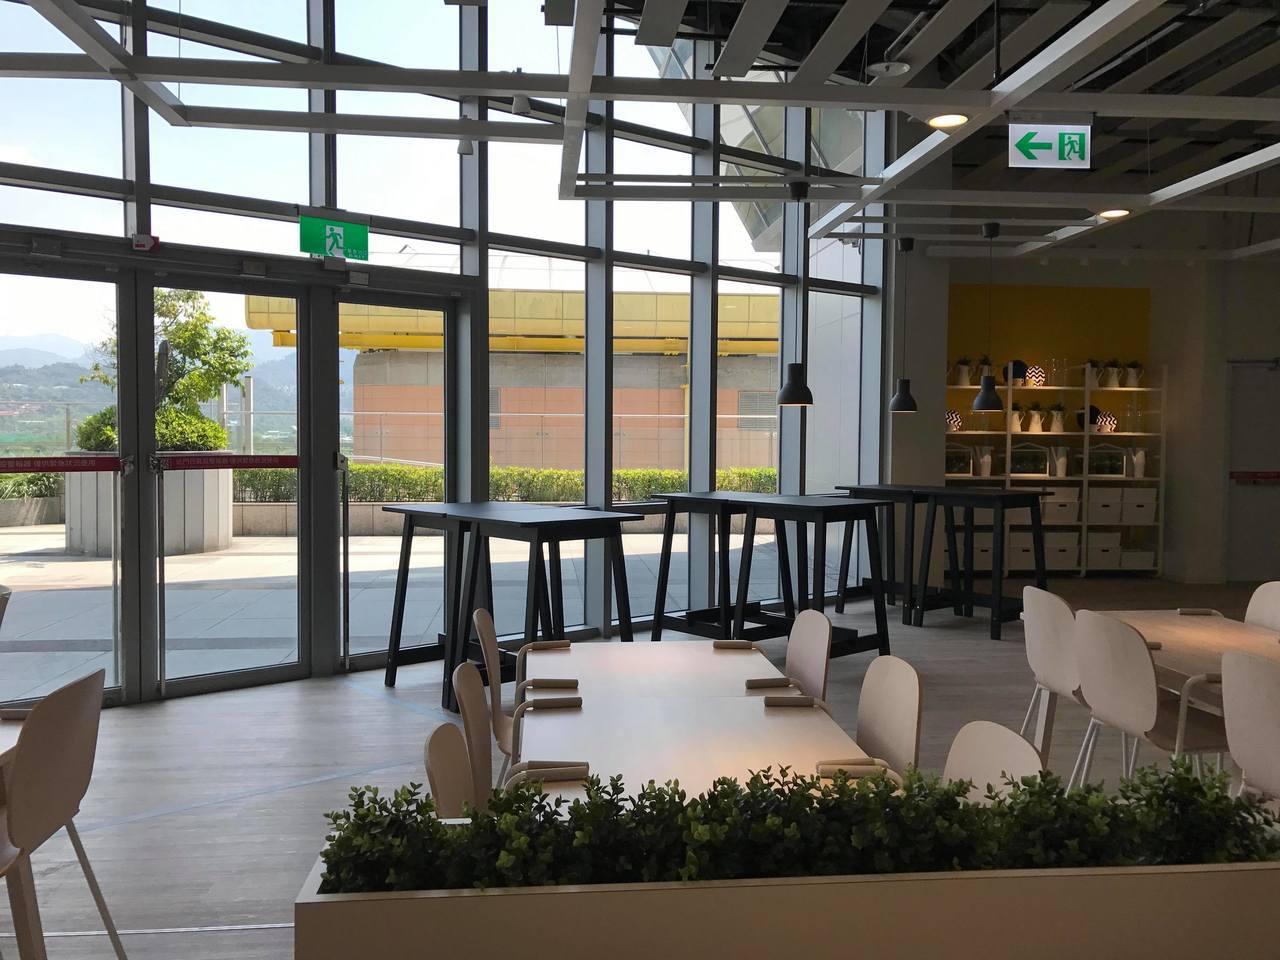 IKEA新店店的瑞典餐廳戶外連結陽光運動公園廊道。記者陳立儀/攝影